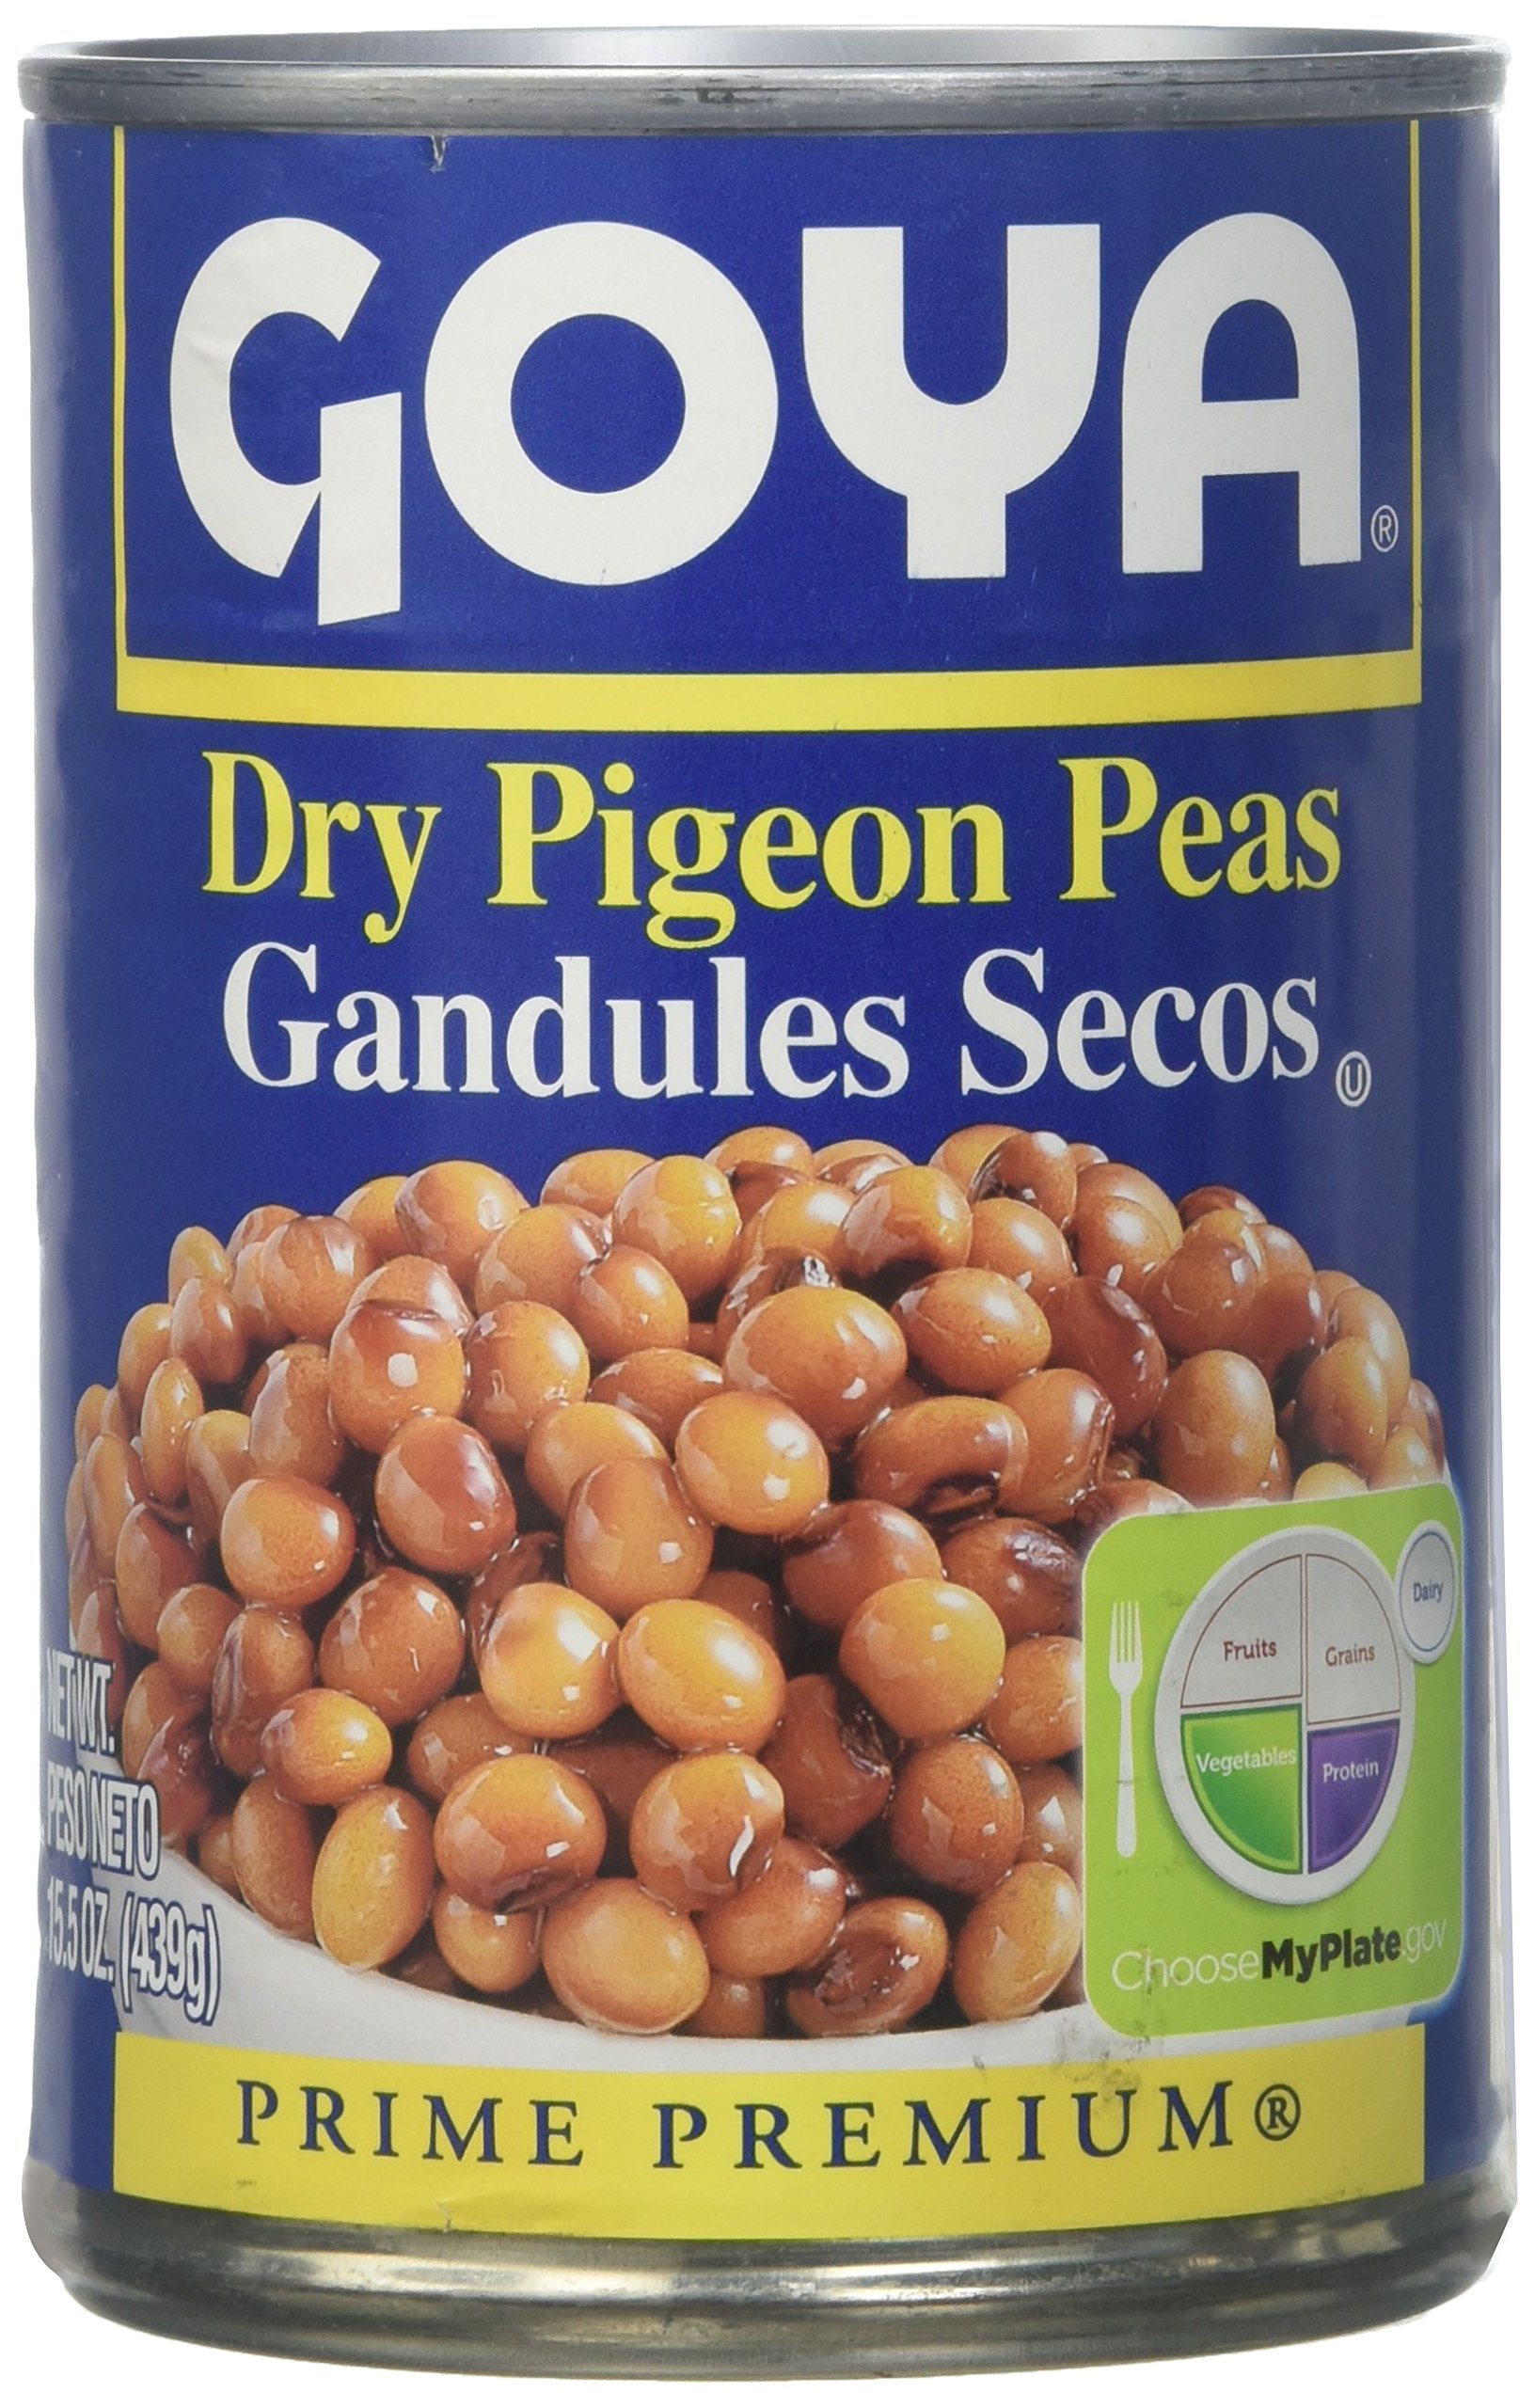 6 Cans of Goya Dry Pigeon Peas 15.5oz can (Gandules Secos en Lata 439gr.) (6 Latas)